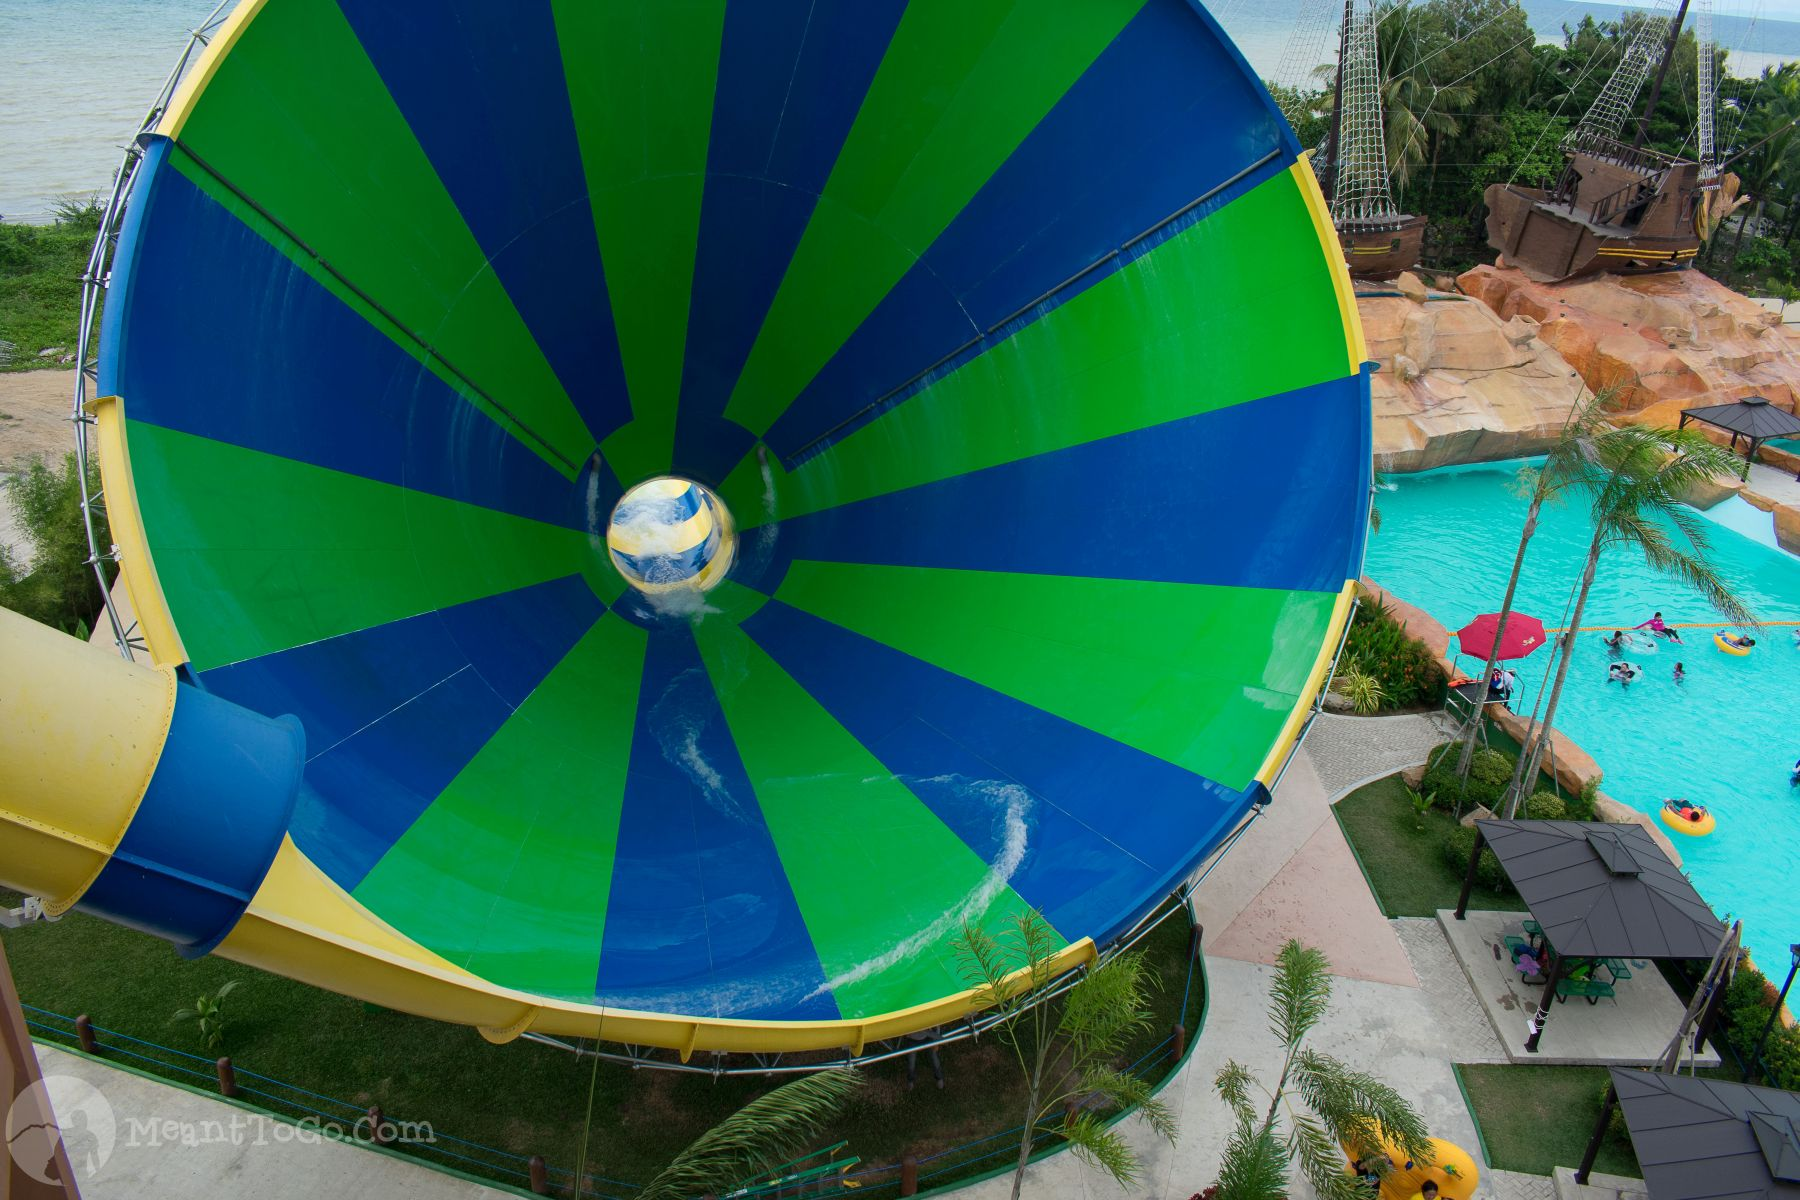 Cyclone Slide at Seven Seas Waterpark & Resort